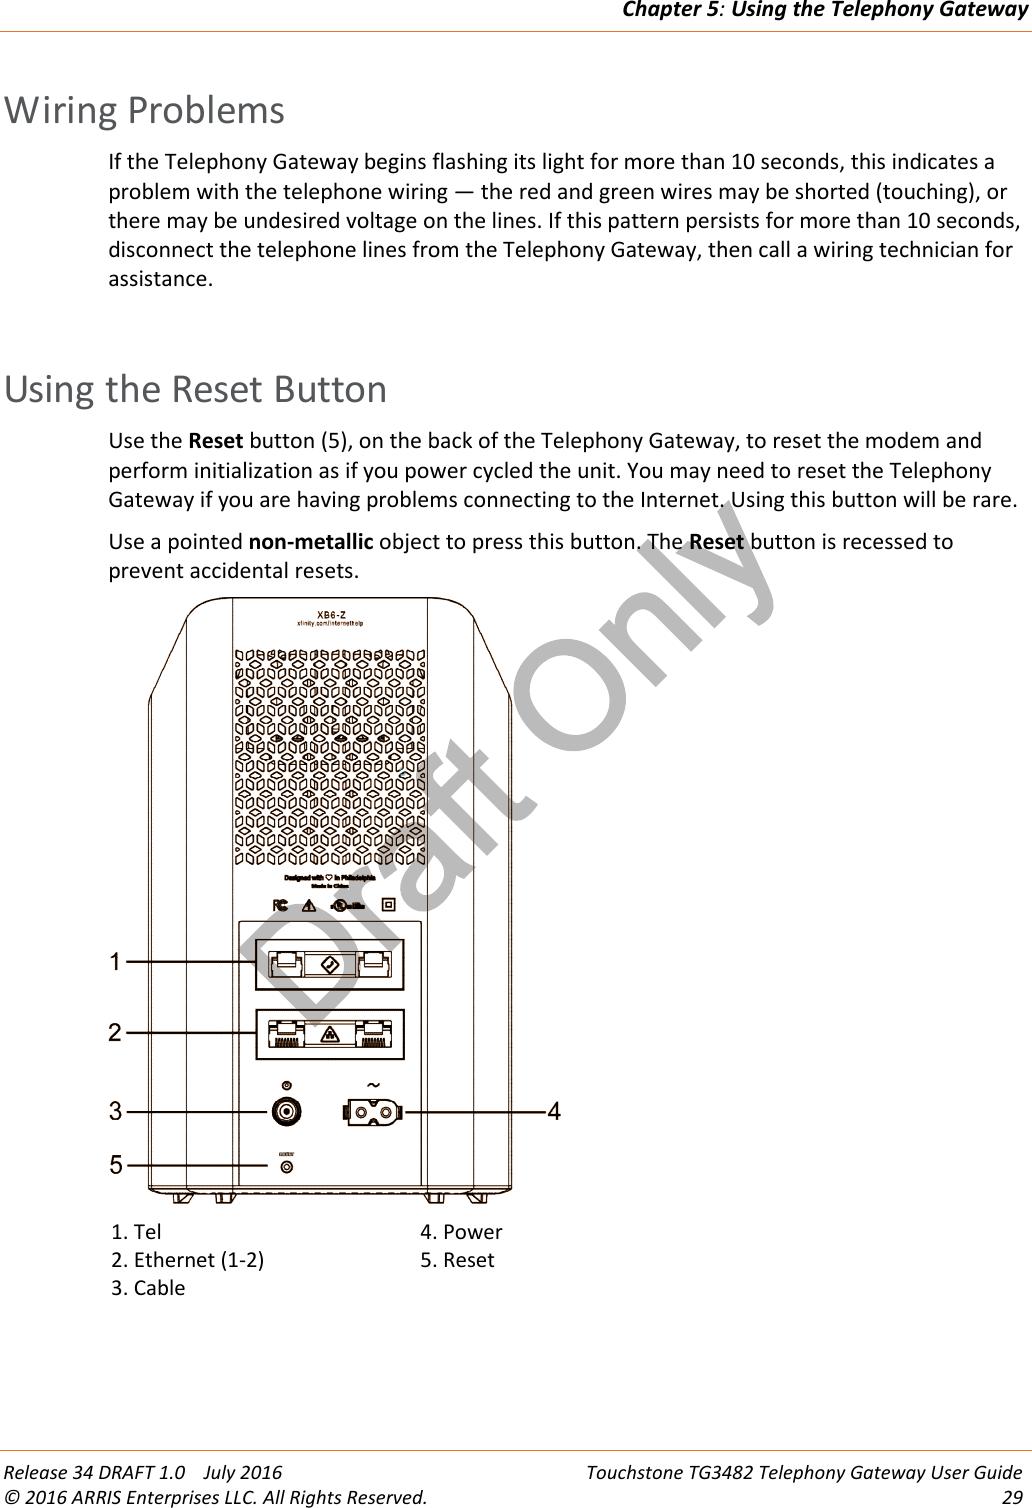 barista manual 1.0 pdf download